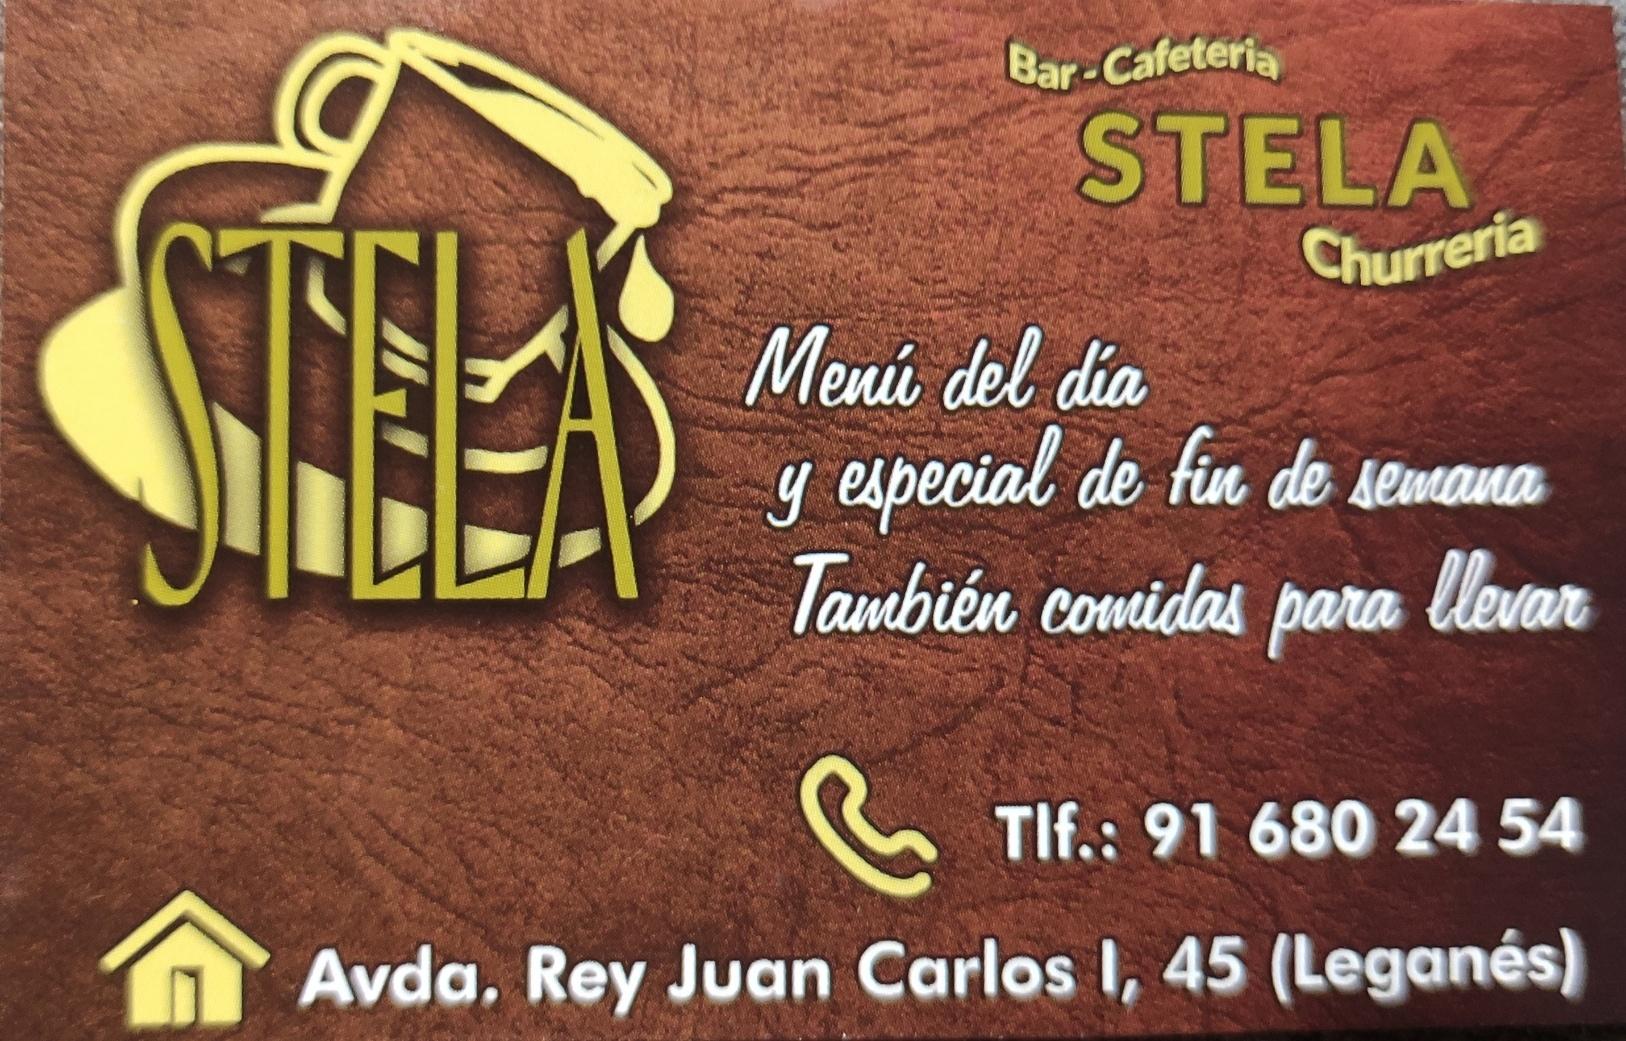 Bar Cafeteria Stela Churreria  Colaborador Escuela Ciclismo Peña Ciclista Eduardo Chozas - Bicicletas Mañas